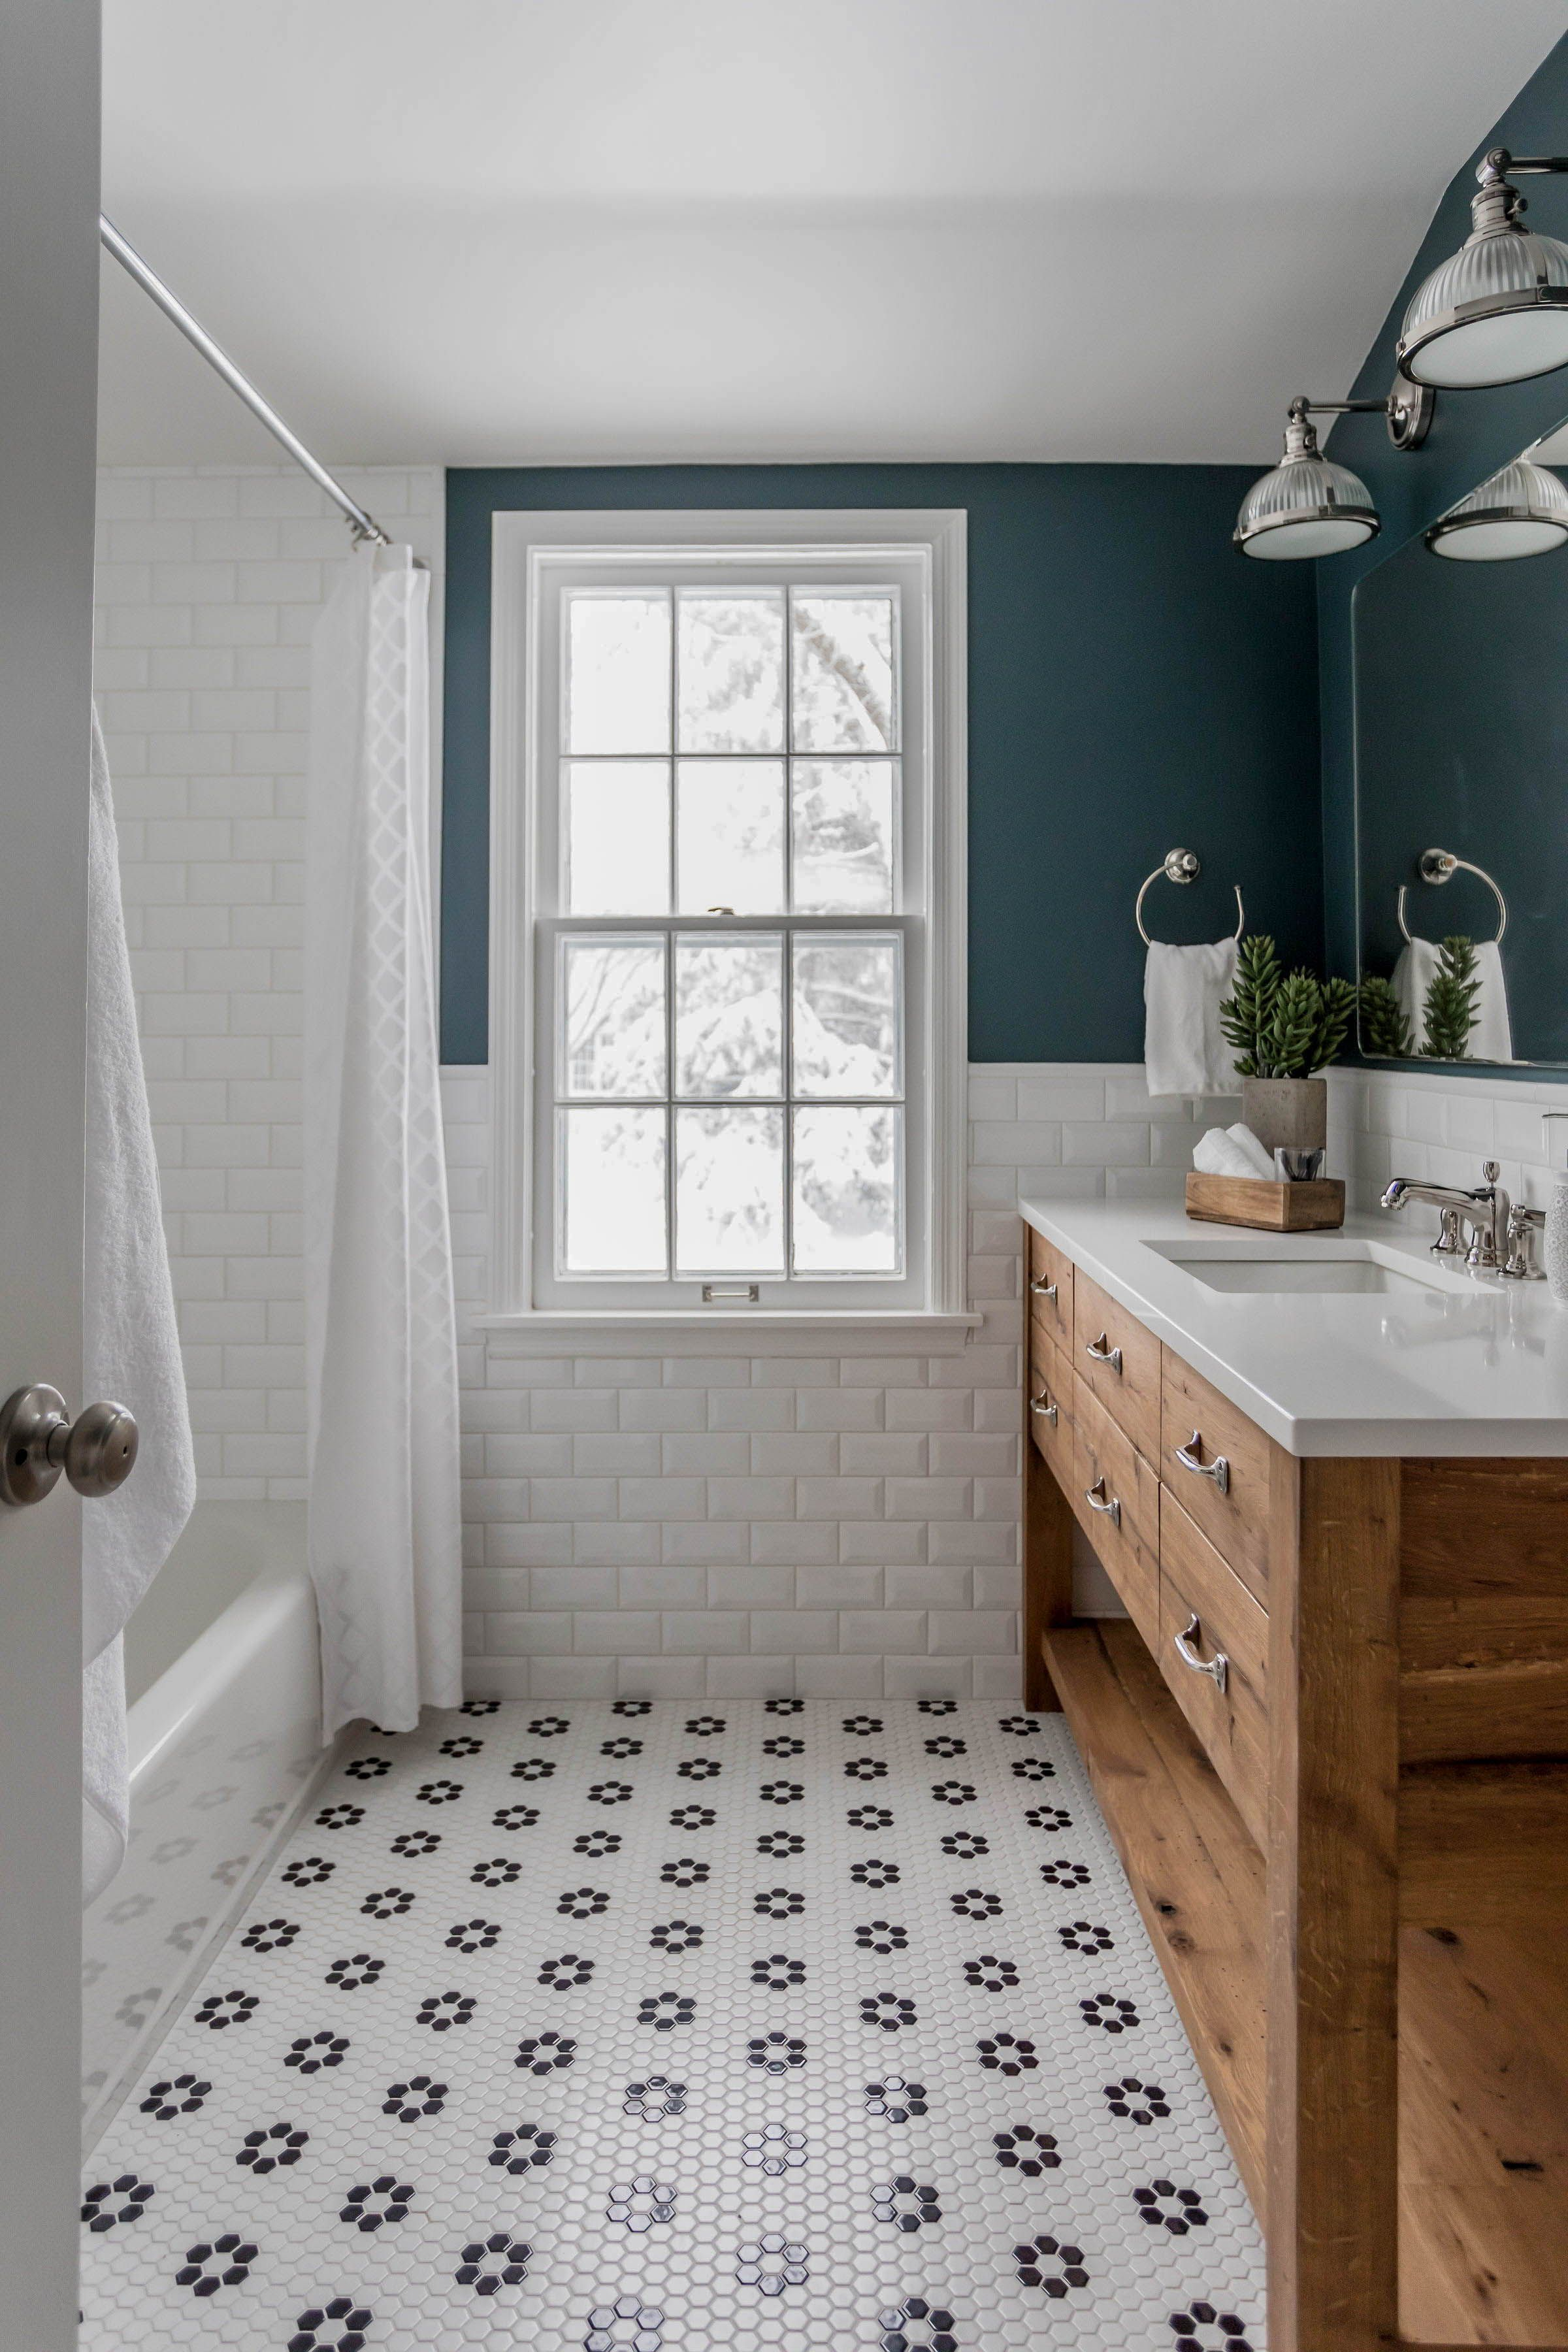 Reclaimed Wood Vanity Black And White Tile Subway Tile Dark Green Bathroom Wa In 2020 Green Bathroom Dark Green Bathrooms Simple Bathroom